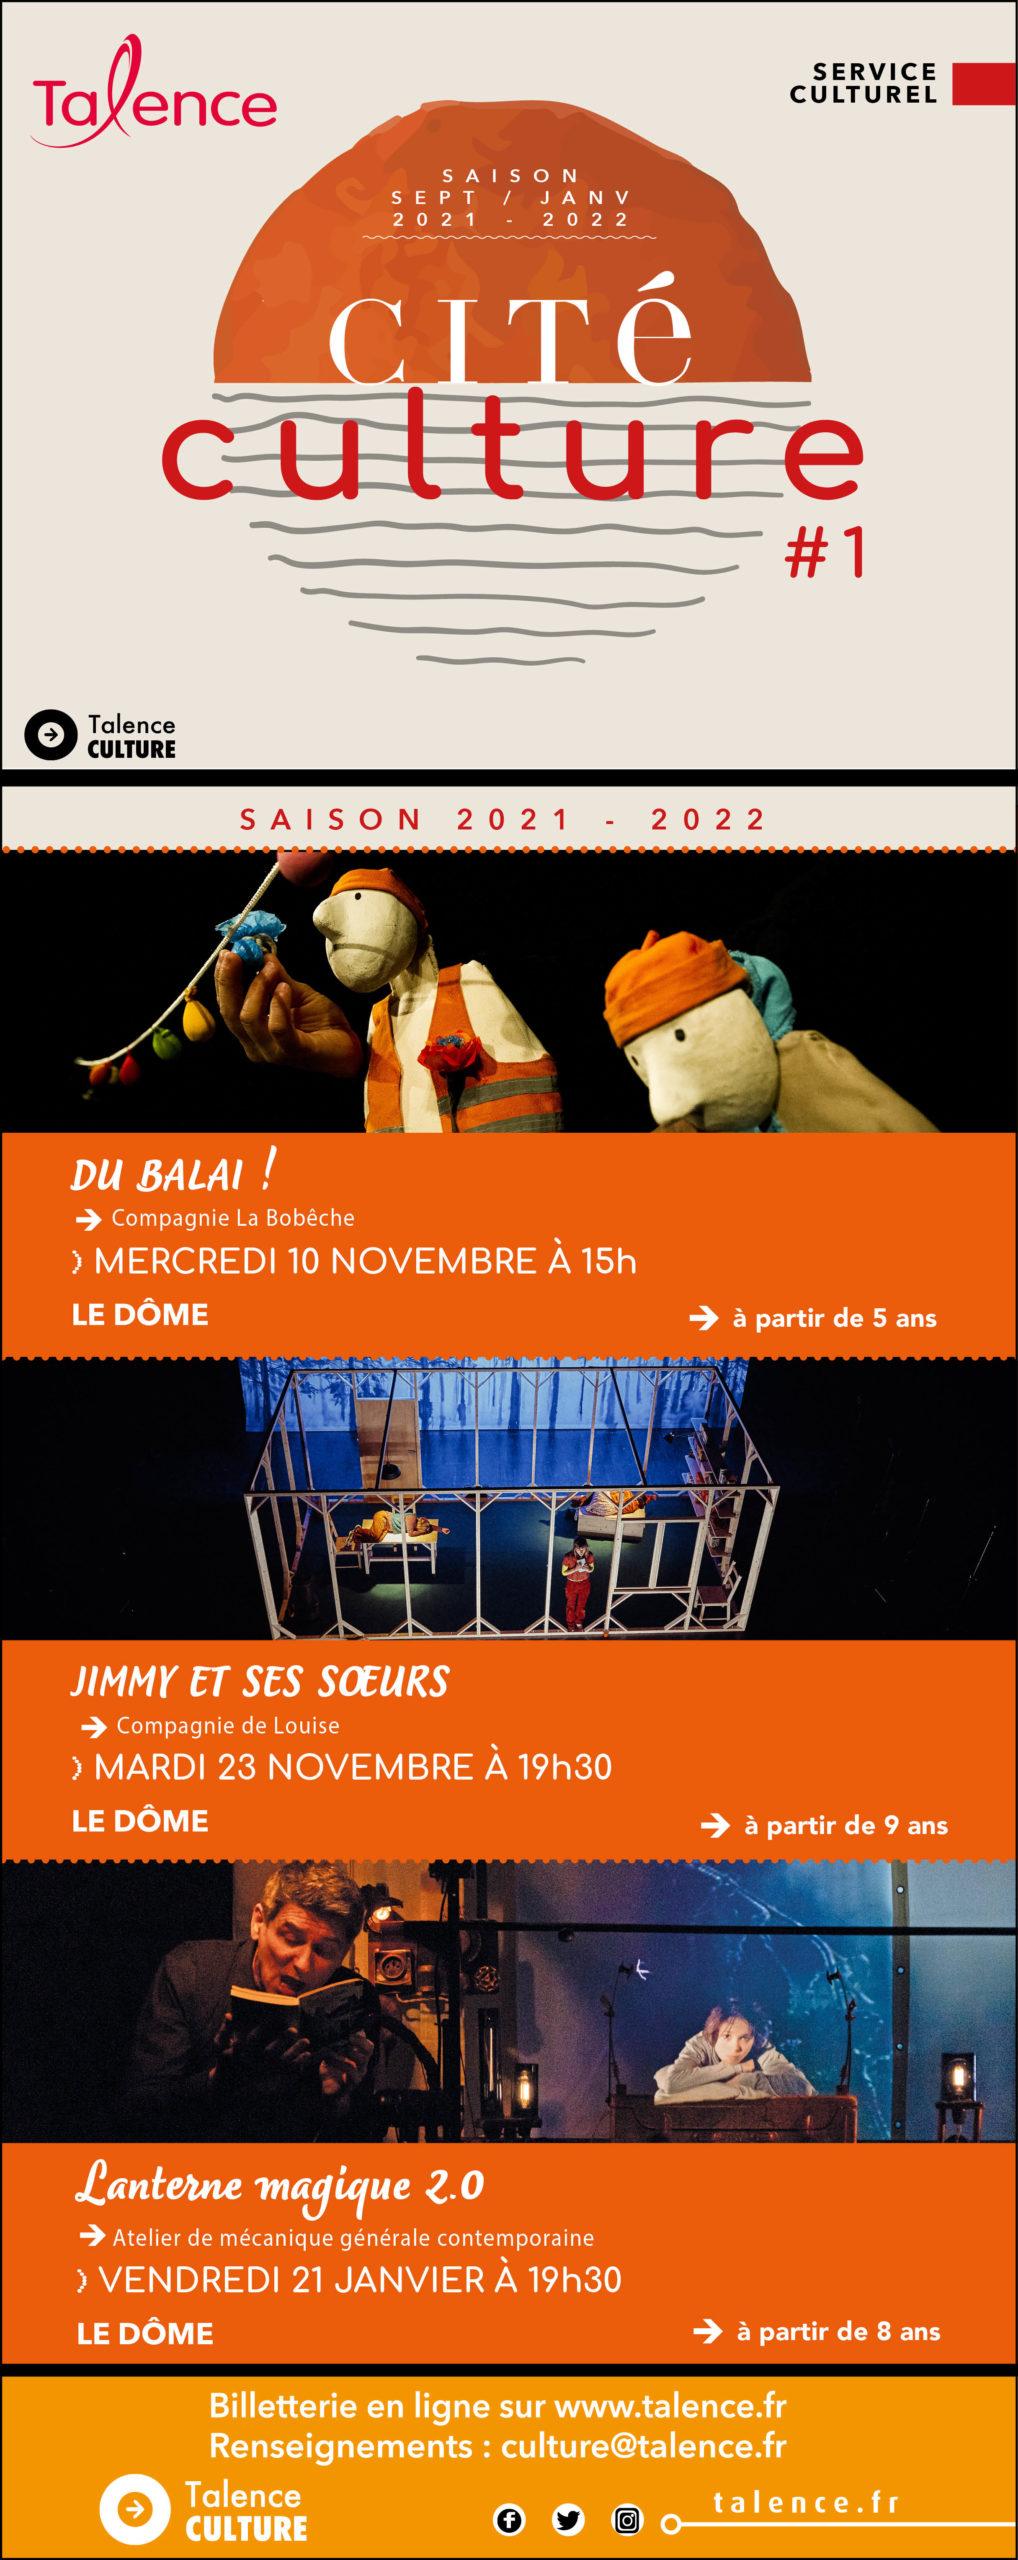 saison culturelle talence 2021/22